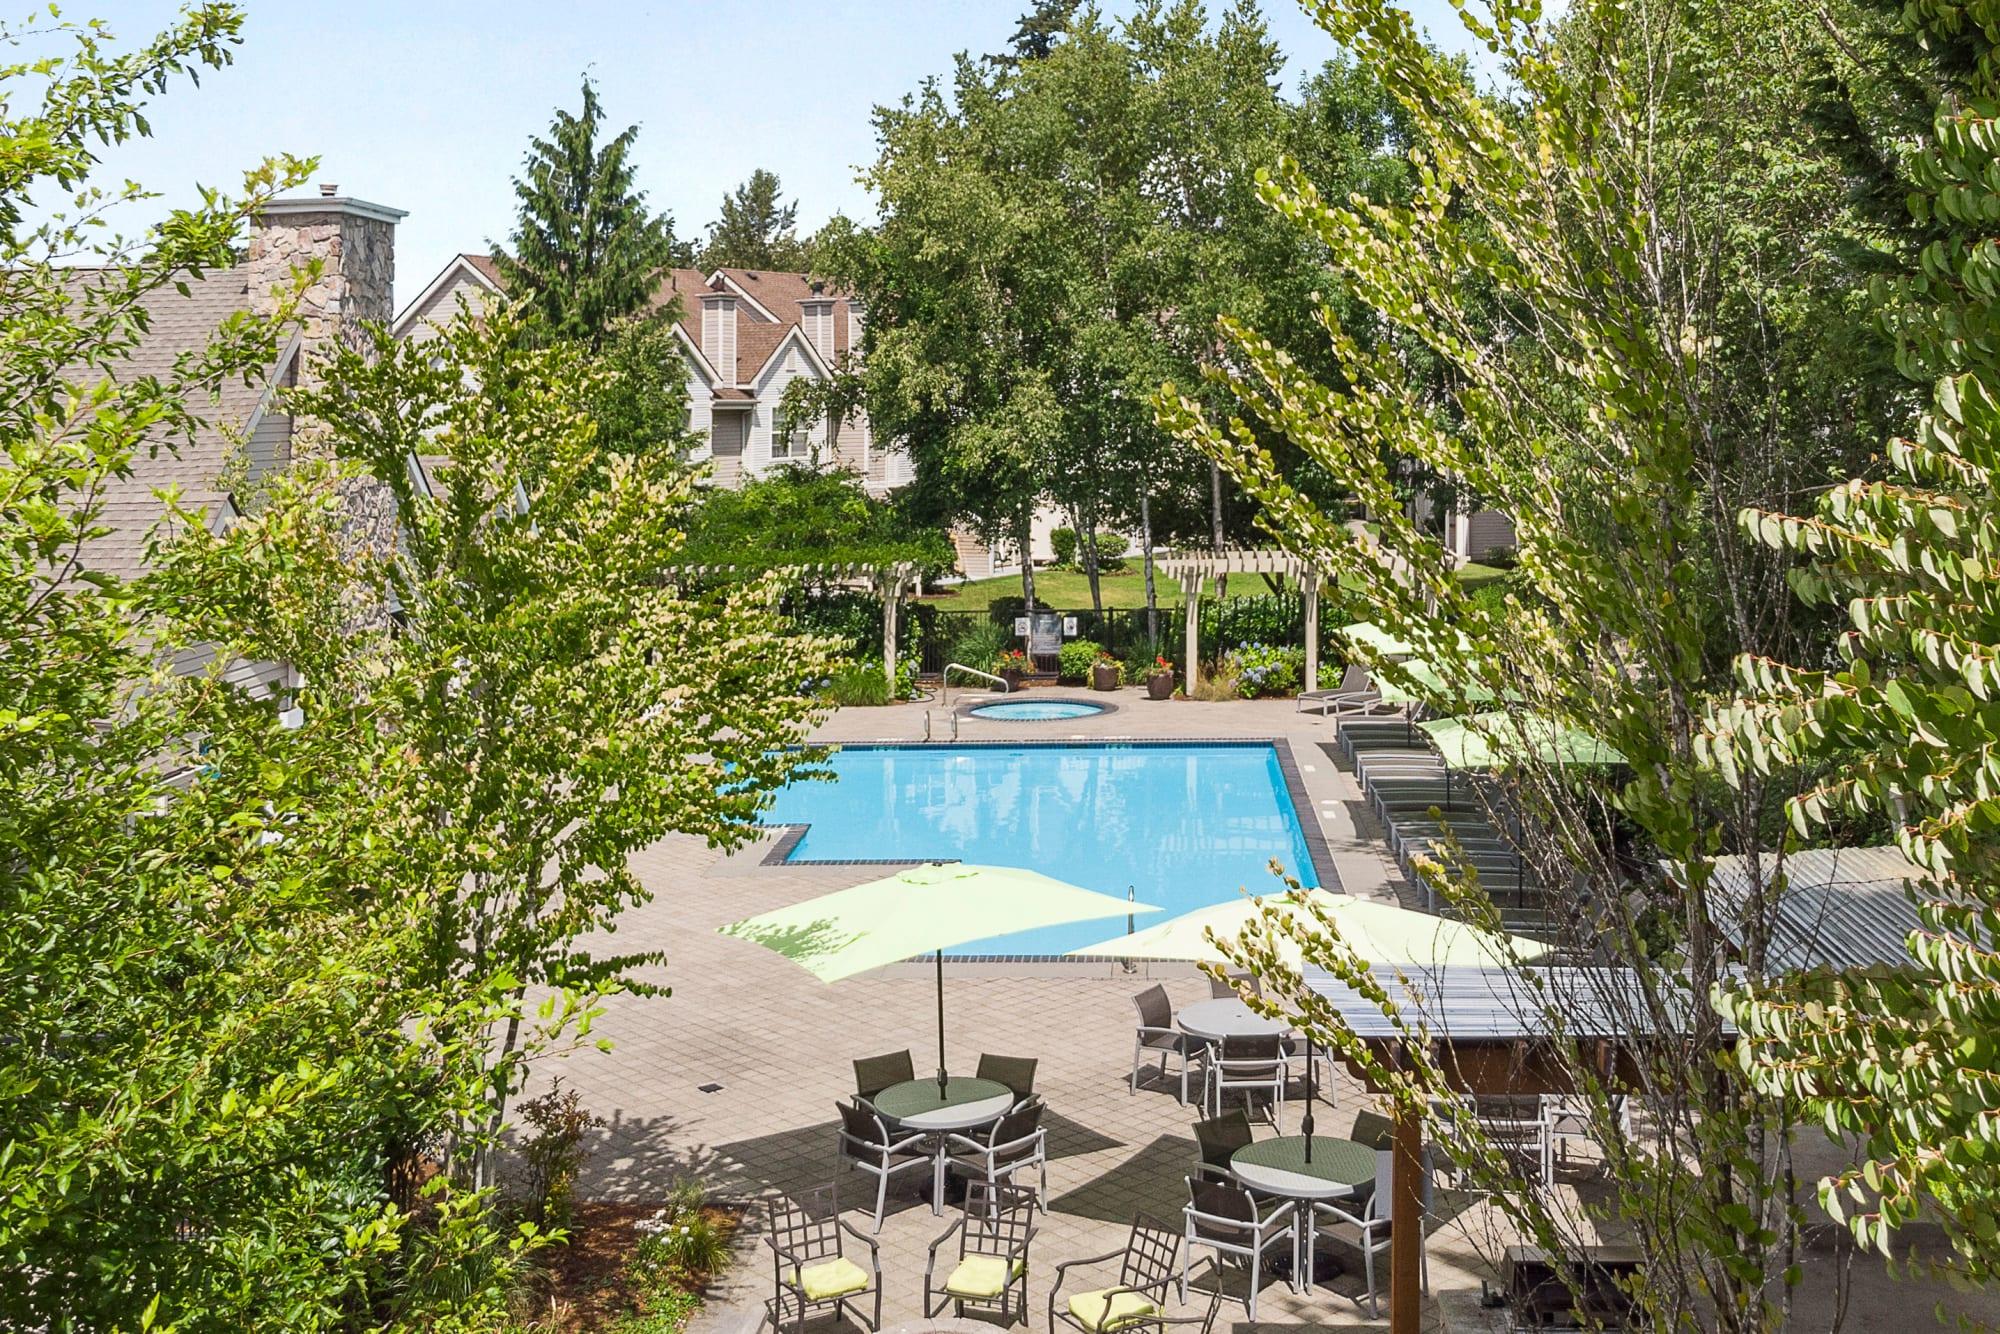 Lush landscaping around the pool at HighGrove Apartments in Everett, Washington